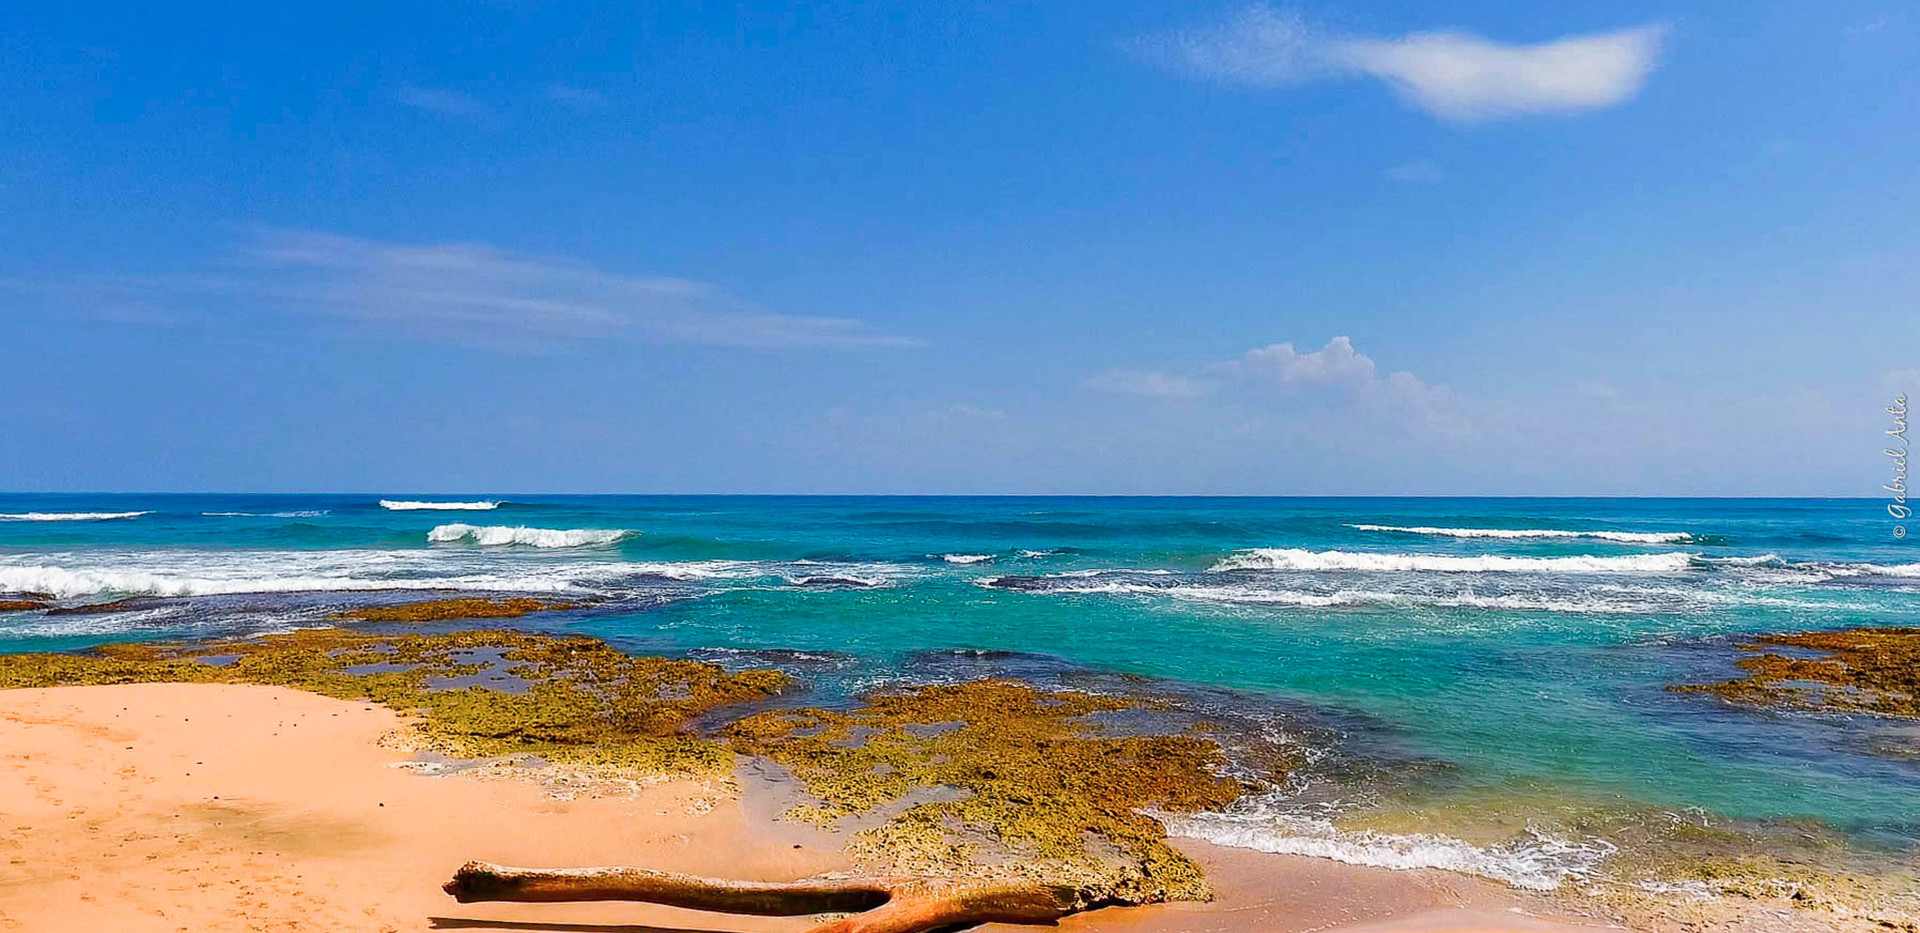 Playa-Chiquita-foto-Gabriel-Anta-4.jpg